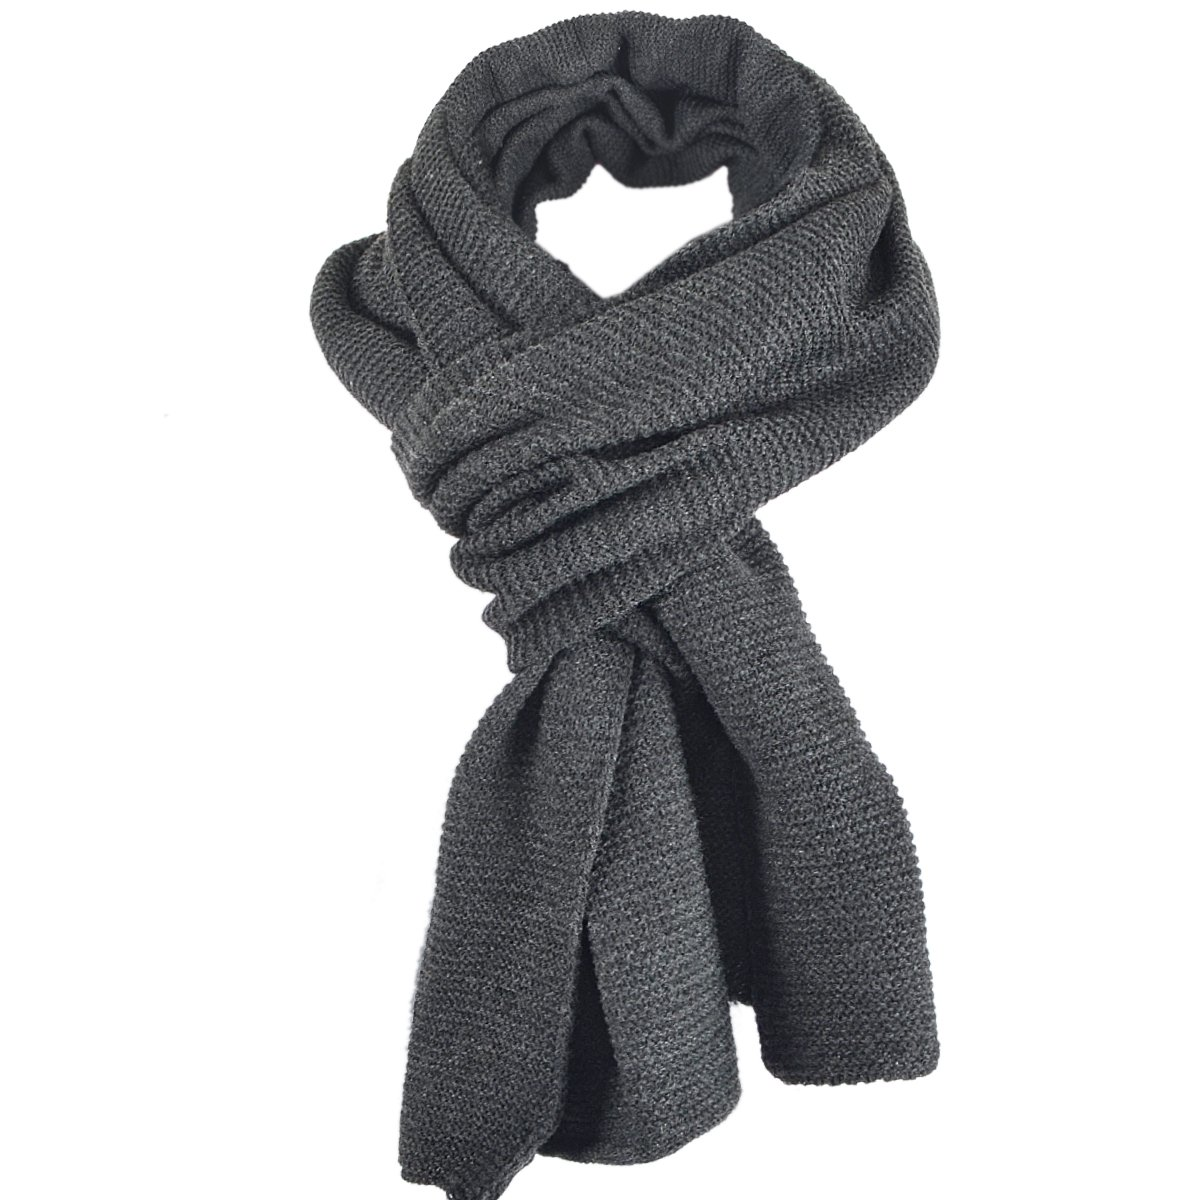 Stylish Unisex Daily Square Pattern Soft Knitted Winter Scarf E5031 (E5081-Dark Grey)